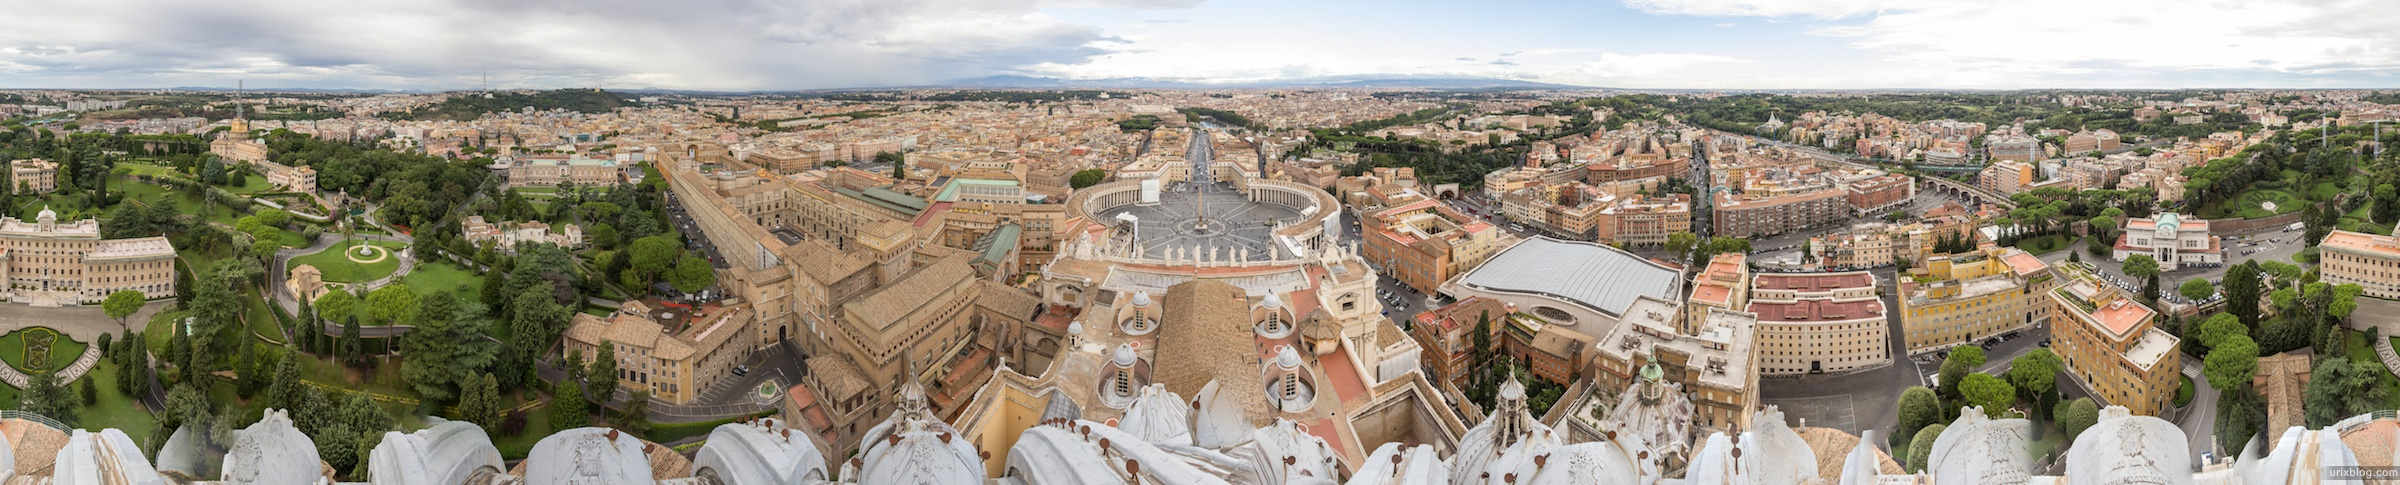 2012, собор святого Петра, Ватикан, Рим, Италия, панорама, Rome, Italy, Vatican, St. Peter's Basilica, panorama